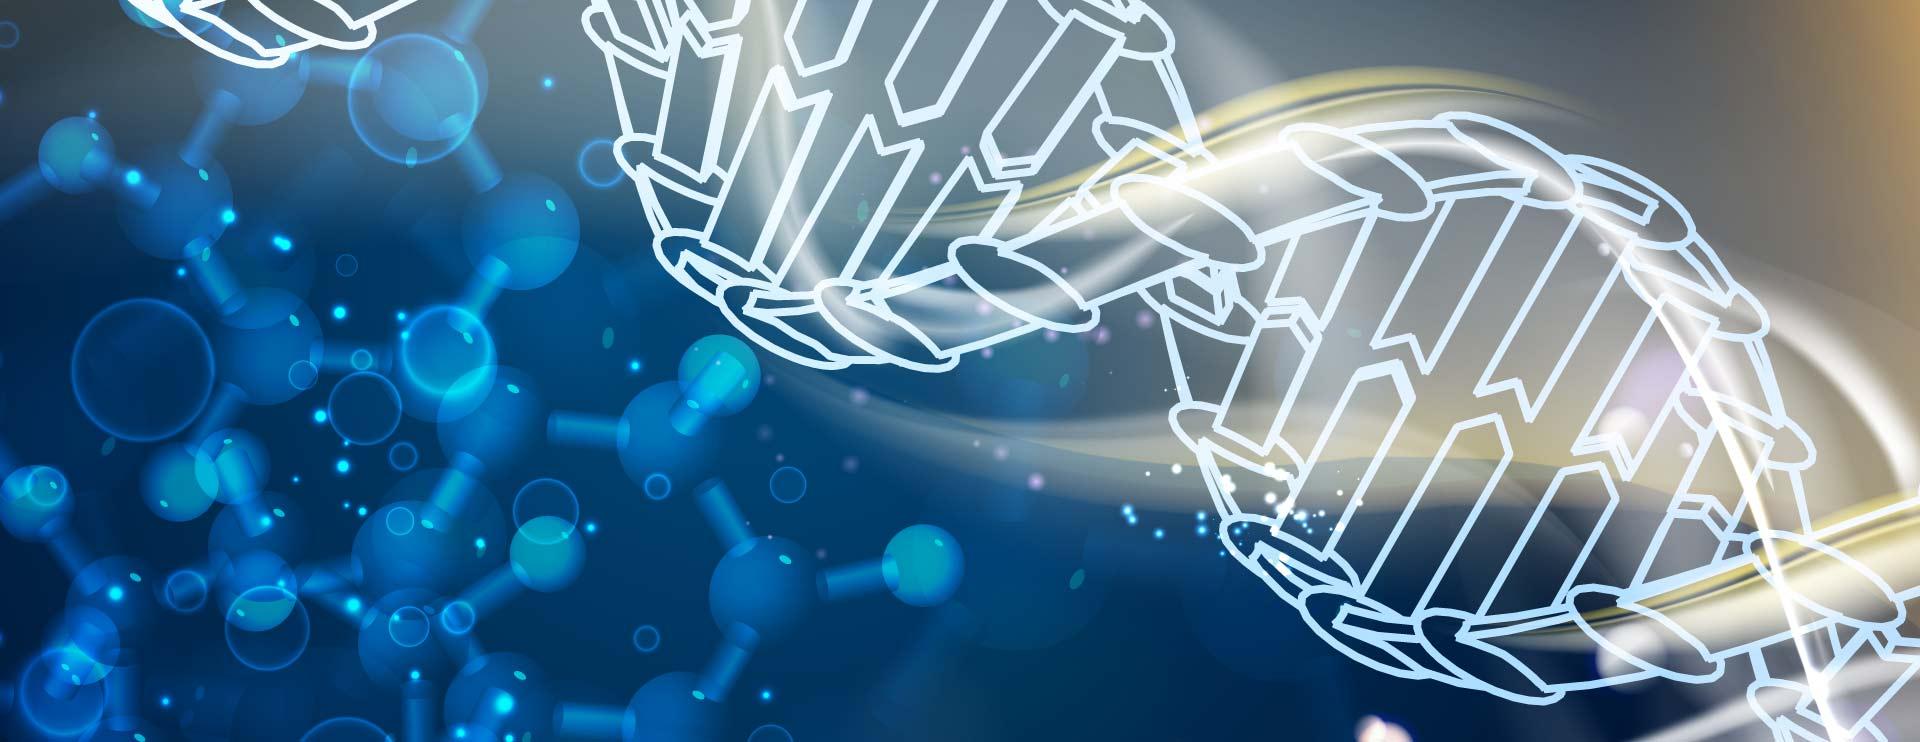 Designed by kotkoa (DNA) and starline (background) / Freepik. Modifié